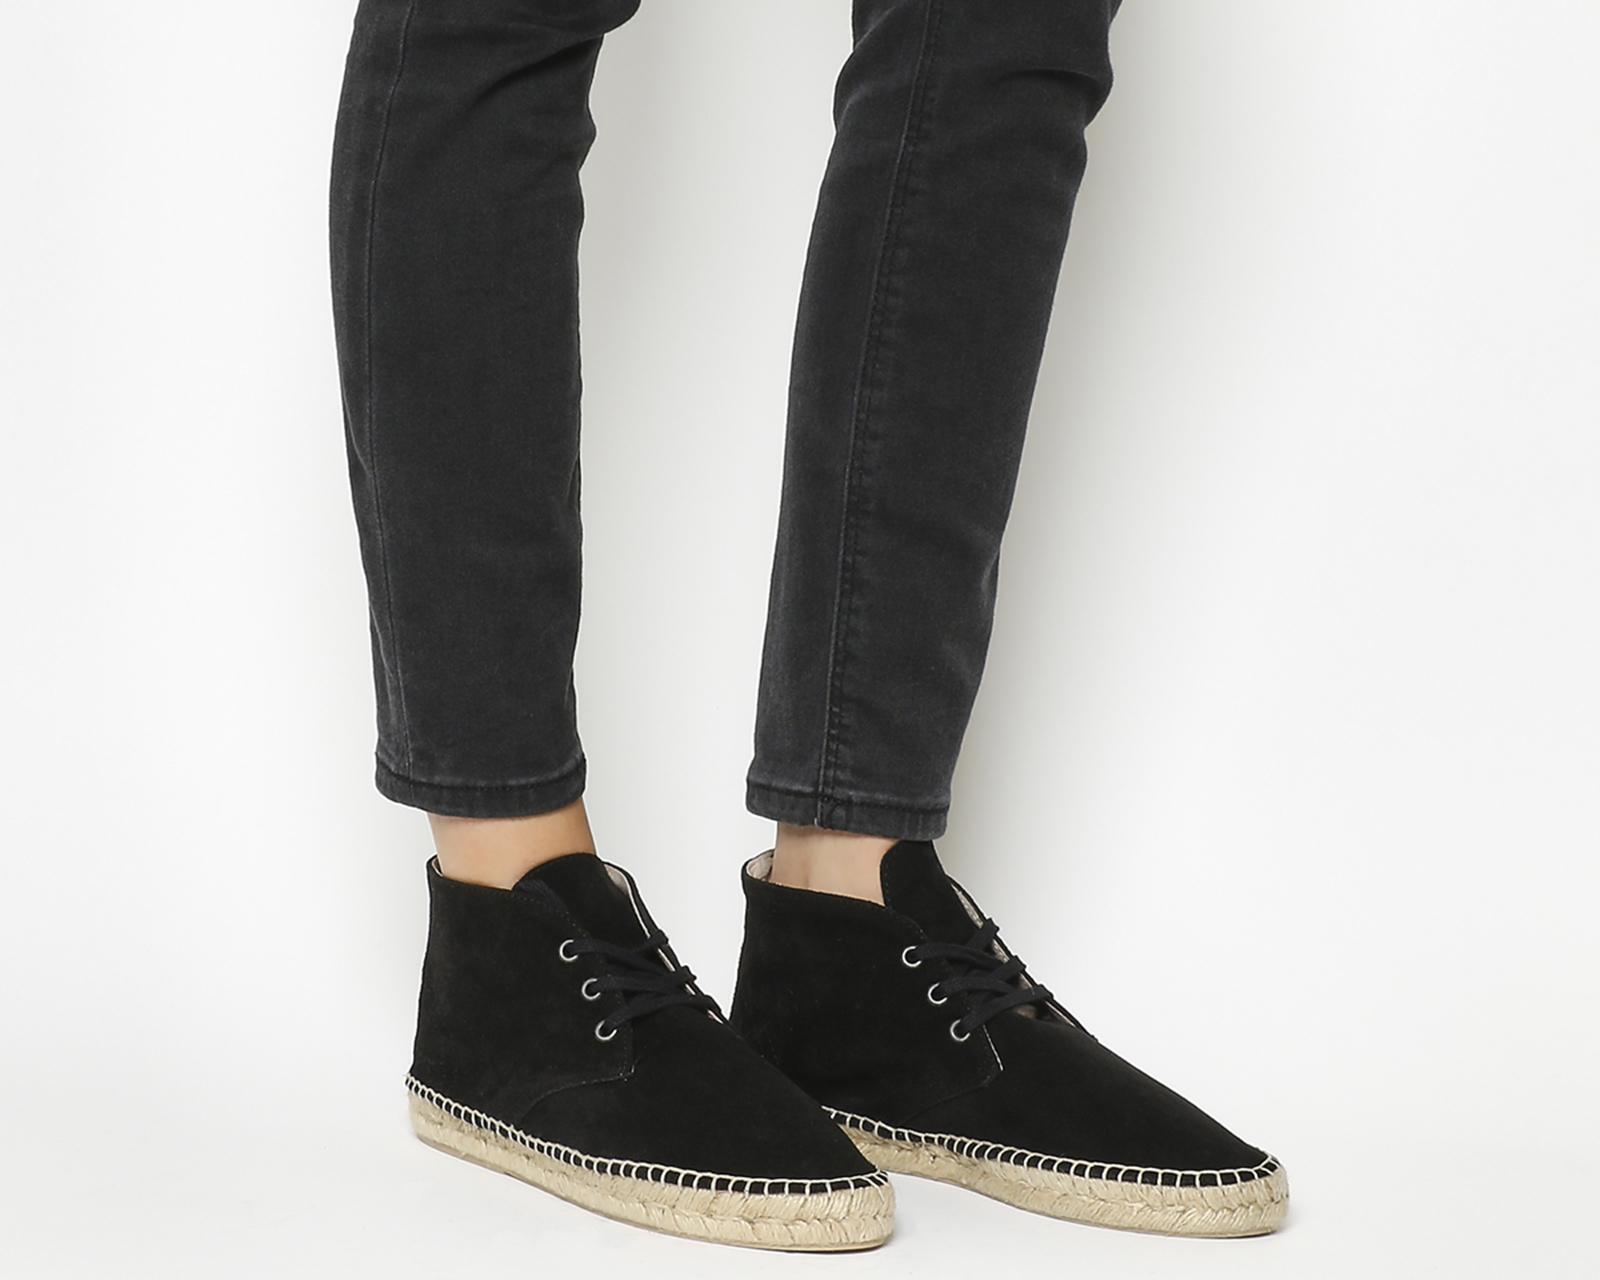 e4c1693a1d56 Sentinel Womens Solillas Espadrille Boot Black Suede Sandals